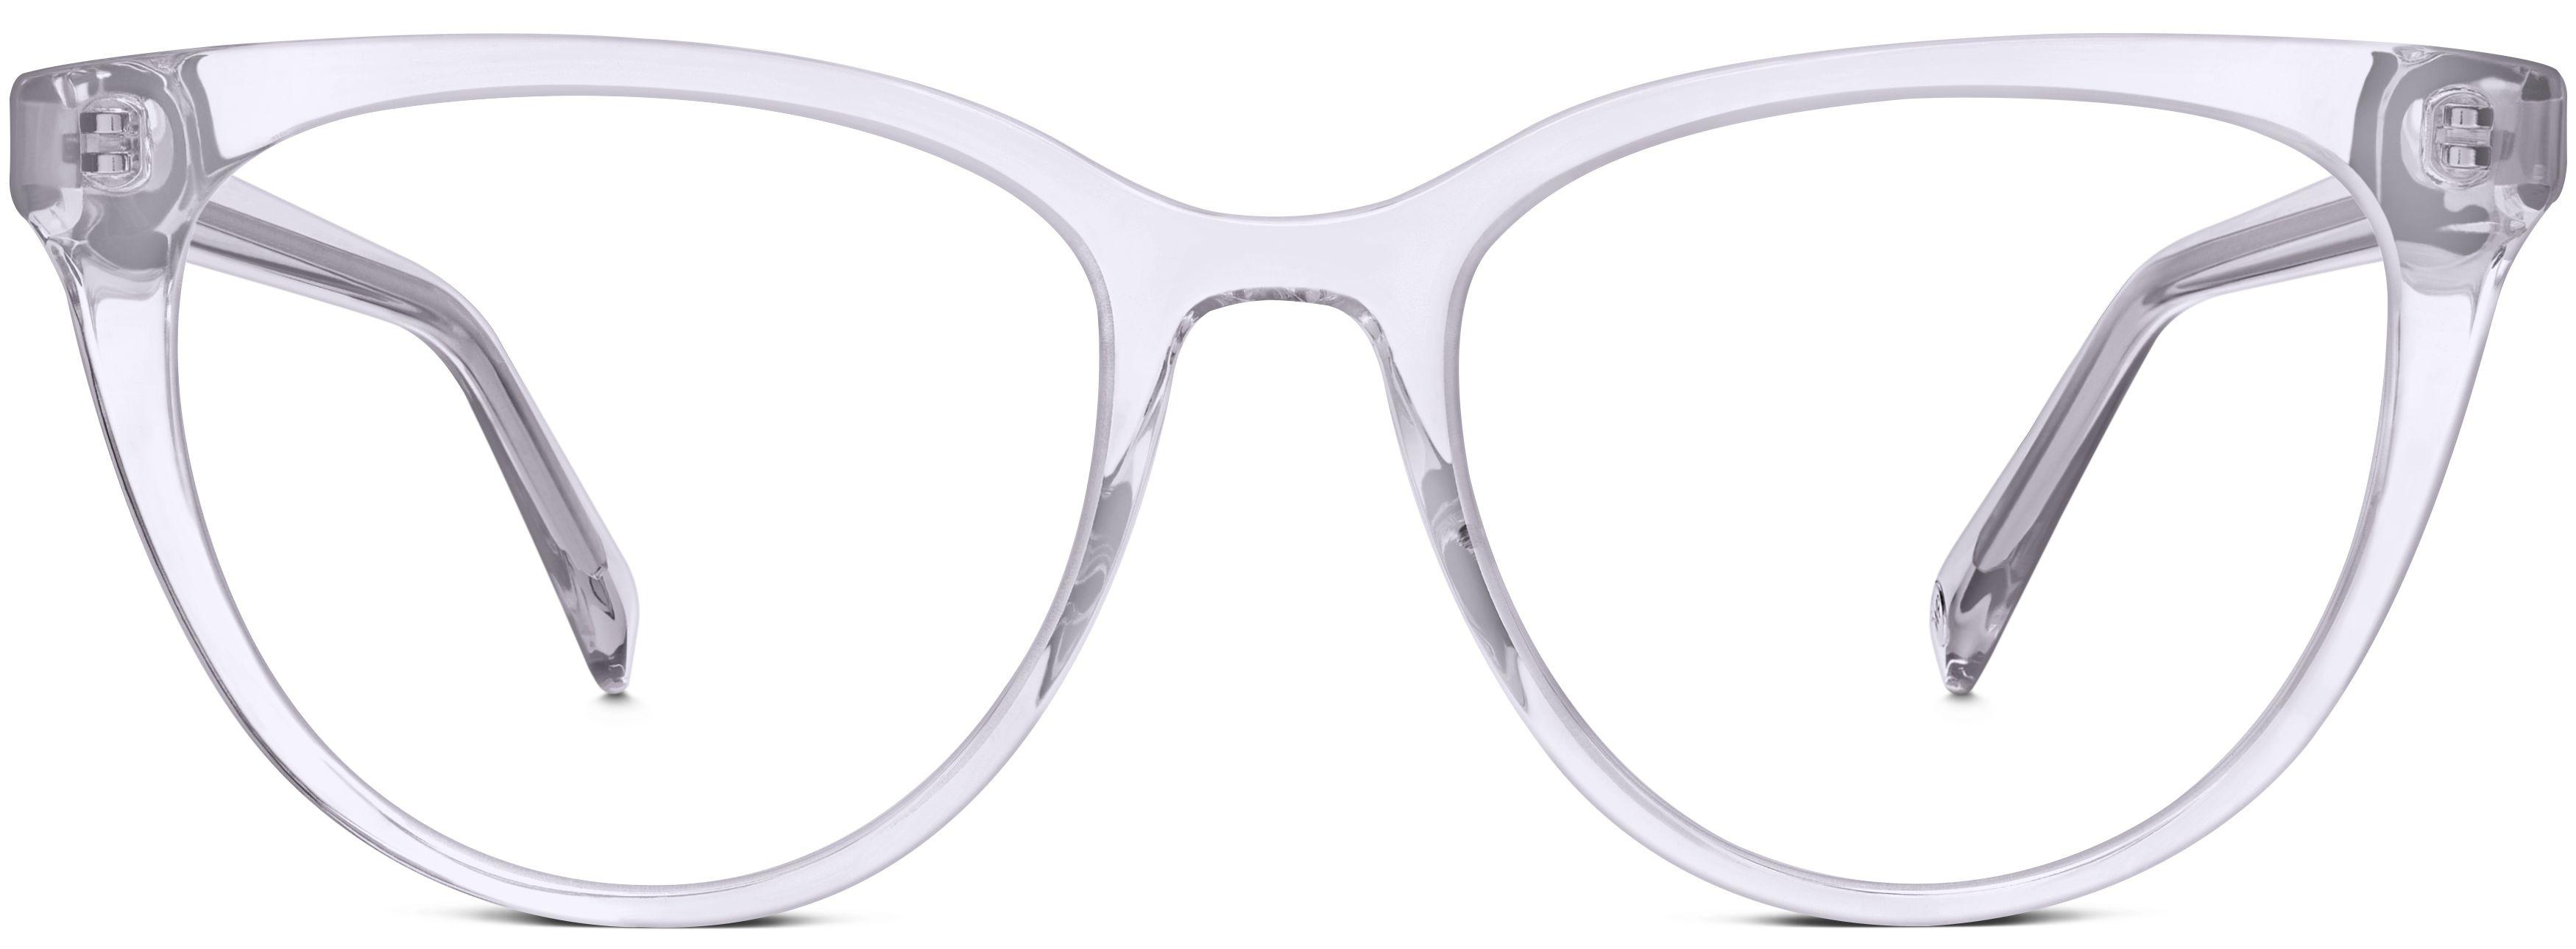 65003e8a63 Haley Eyeglasses in Lavender Crystal for Women